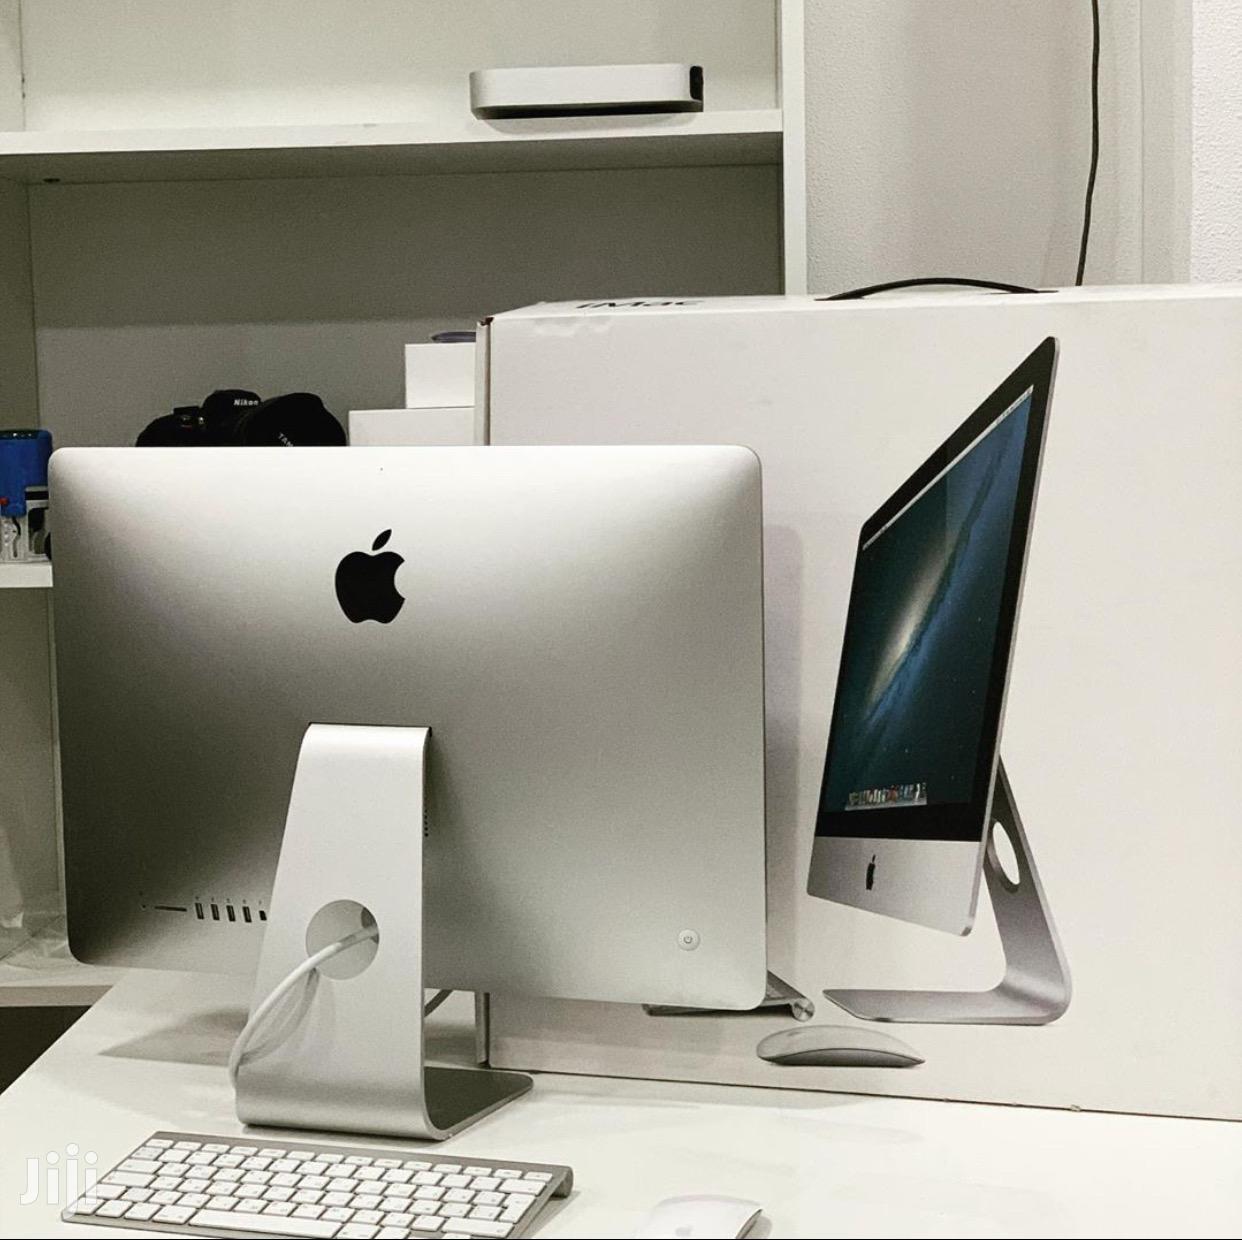 Archive: Desktop Computer Apple iMac 8GB Intel Core I5 HDD 1T